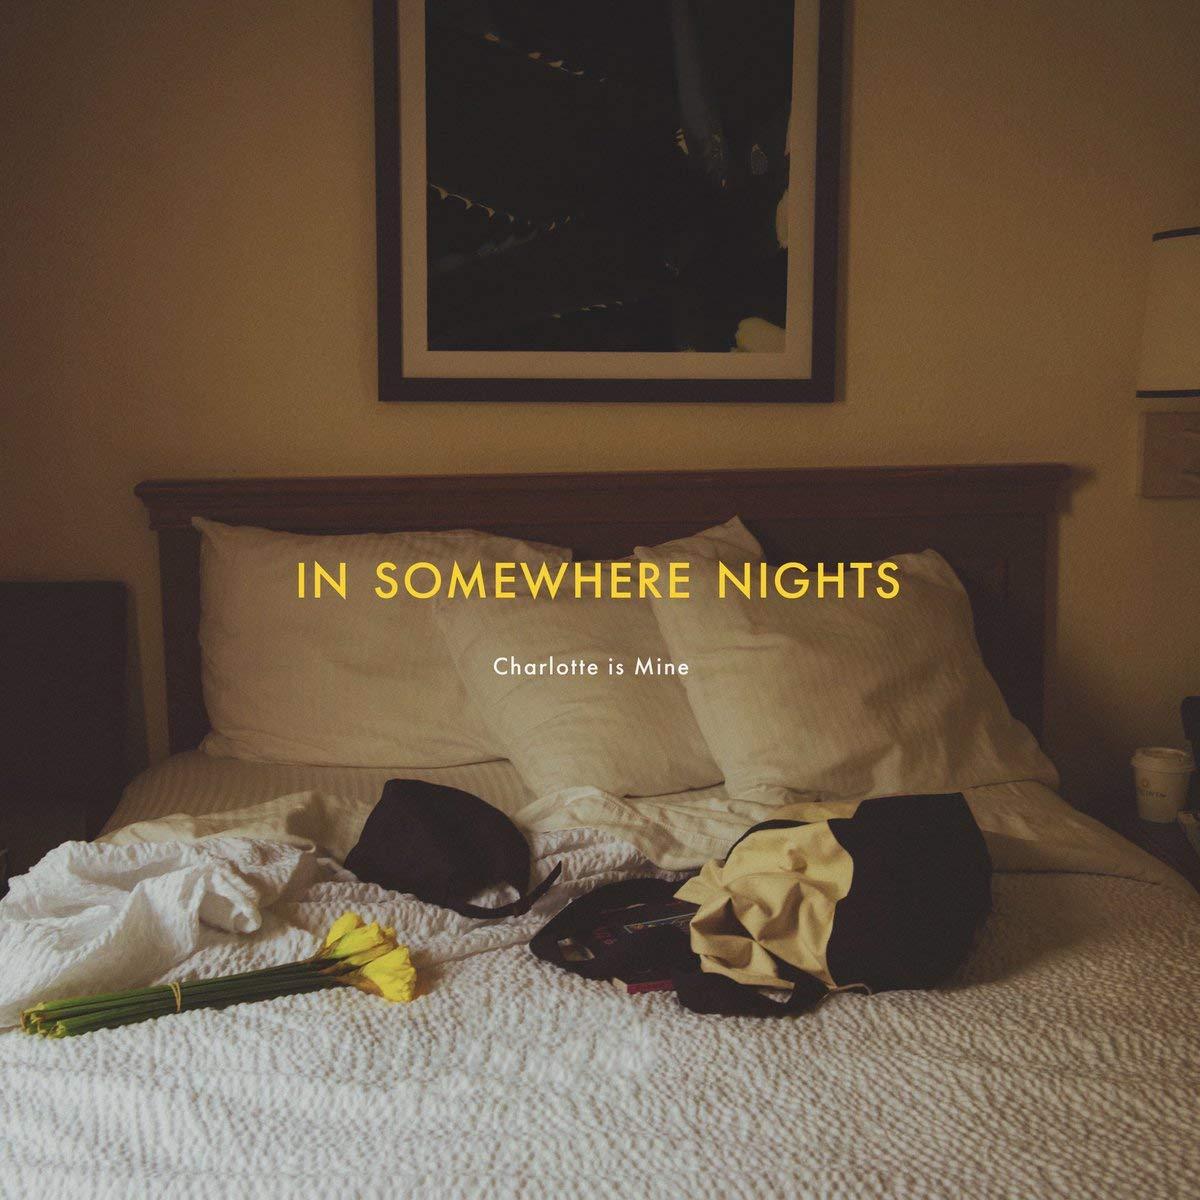 Charlotte is Mine『IN SOMEWHERE NIGHTS』のジャケット写真とアー写を撮りました。